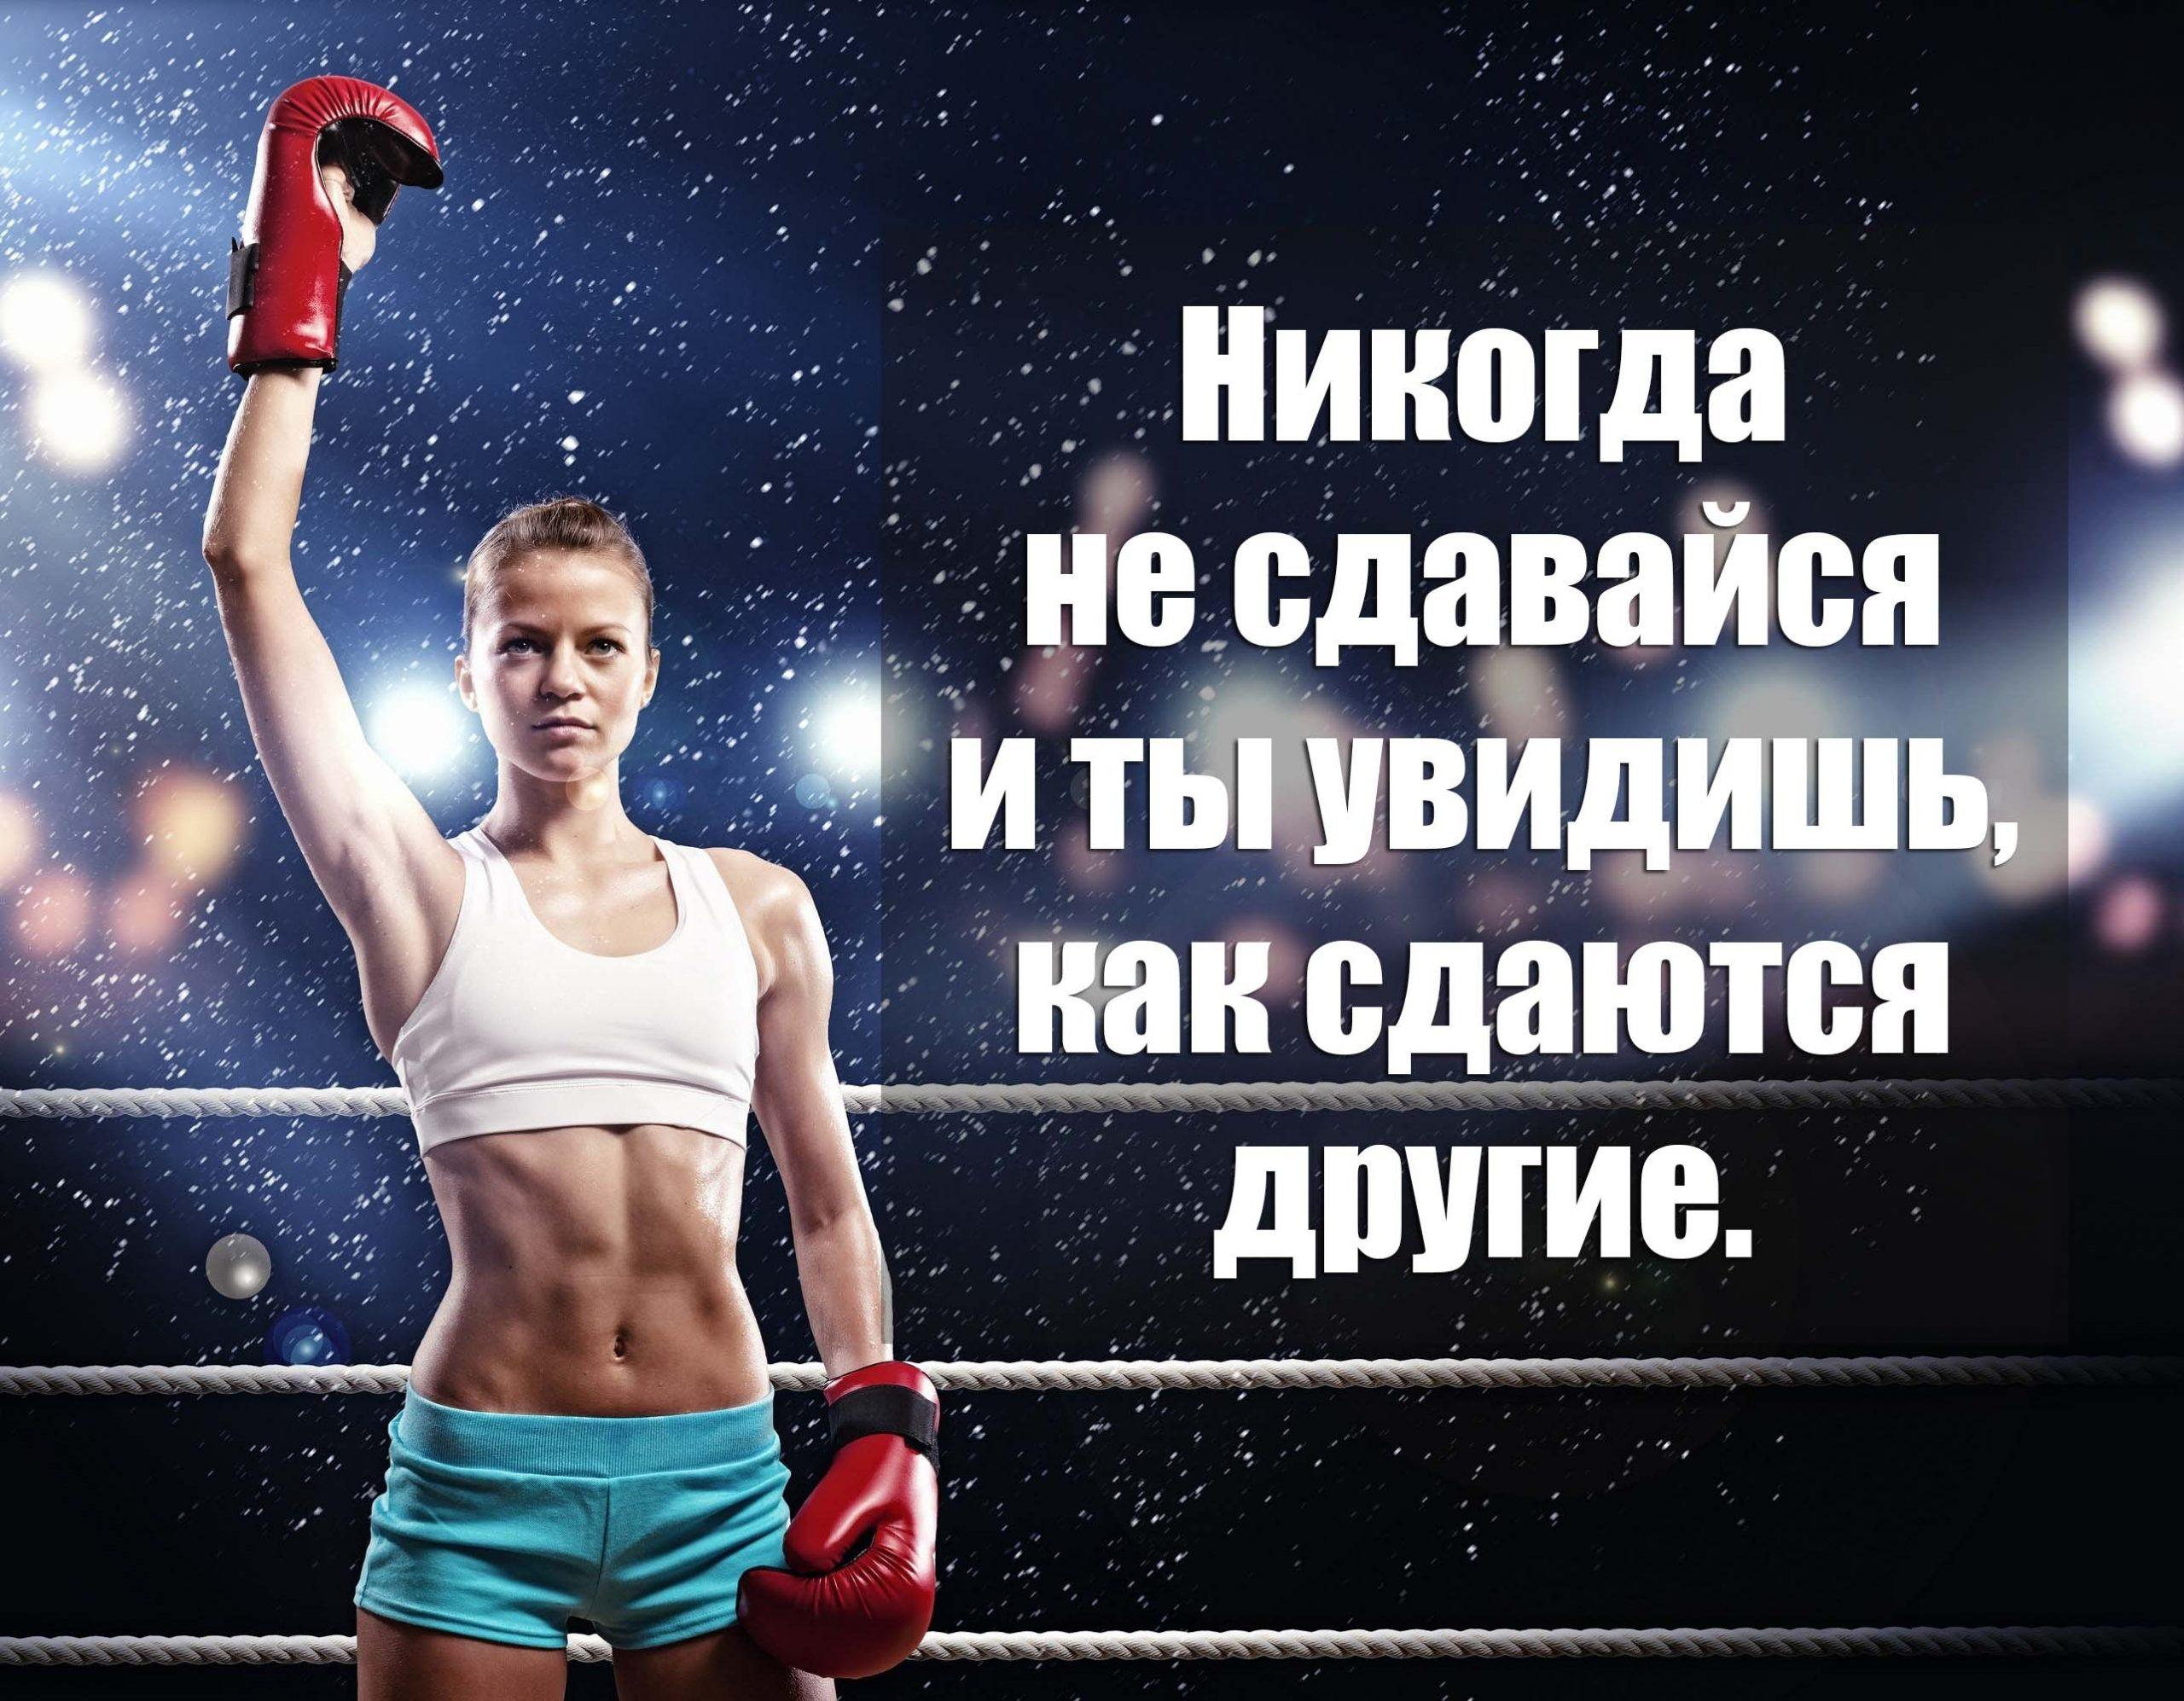 Картинки мотивирующие к спорту